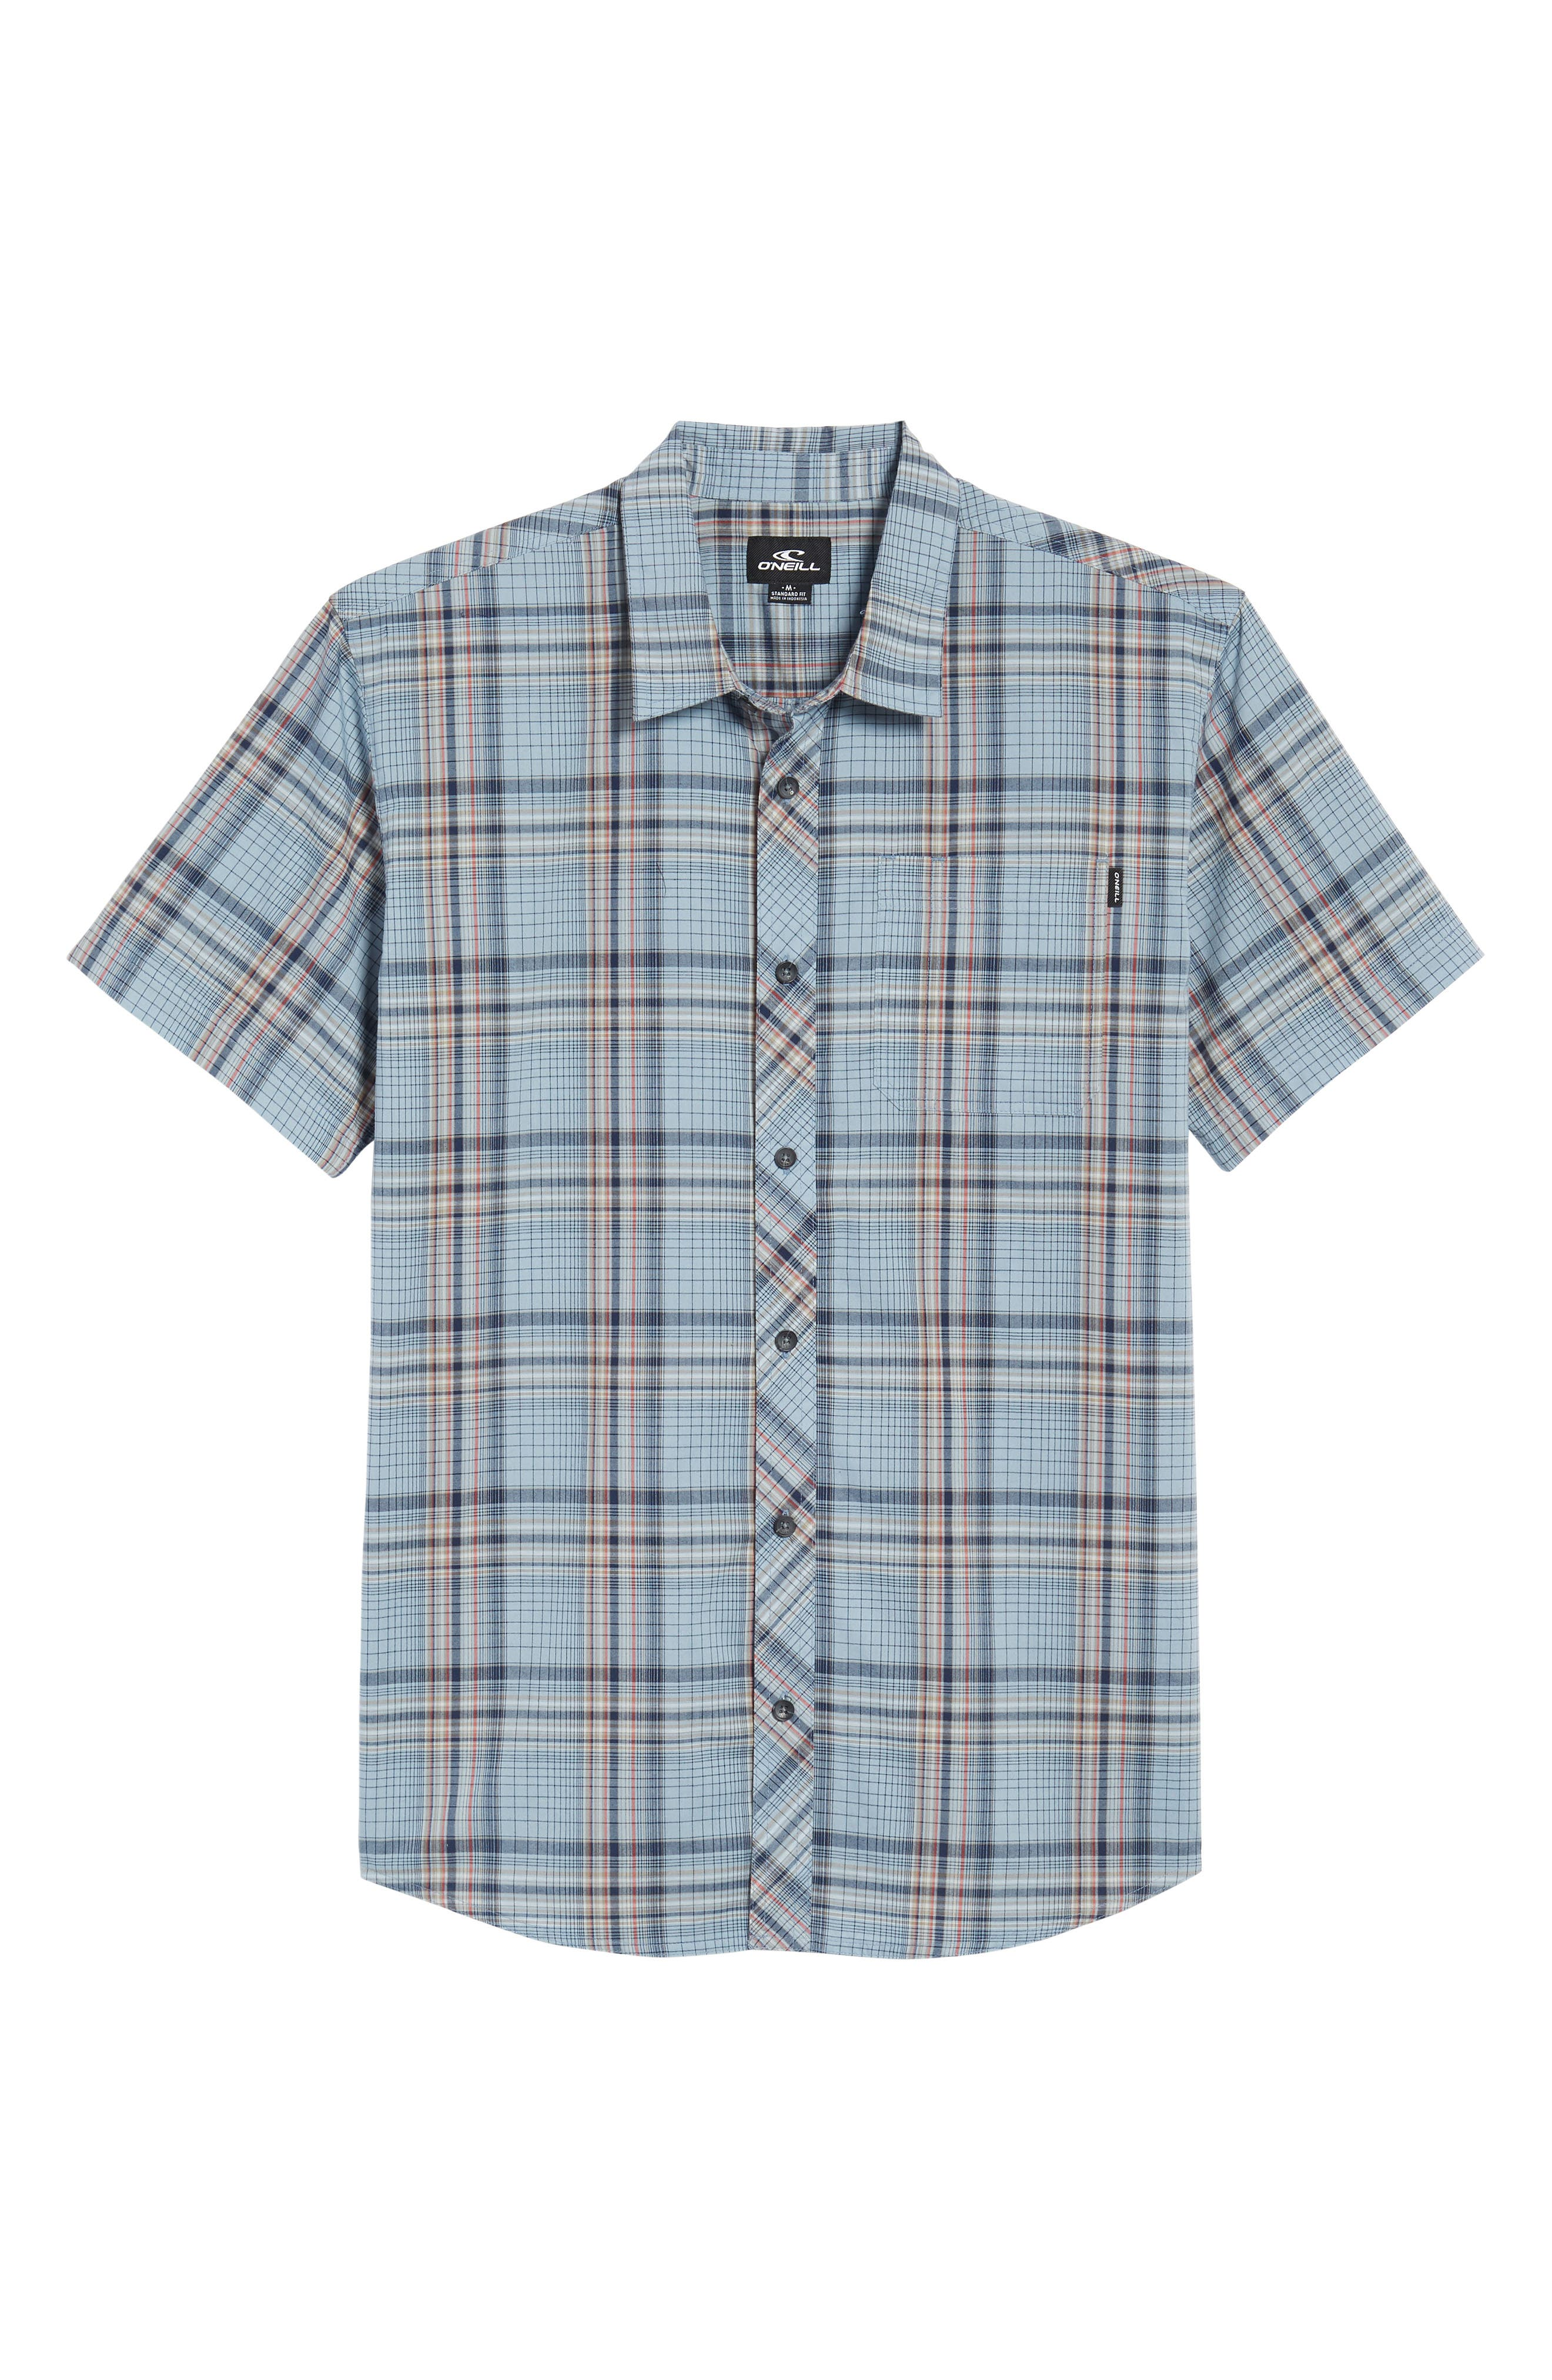 Gentry Short Sleeve Shirt,                             Alternate thumbnail 2, color,                             Asphalt